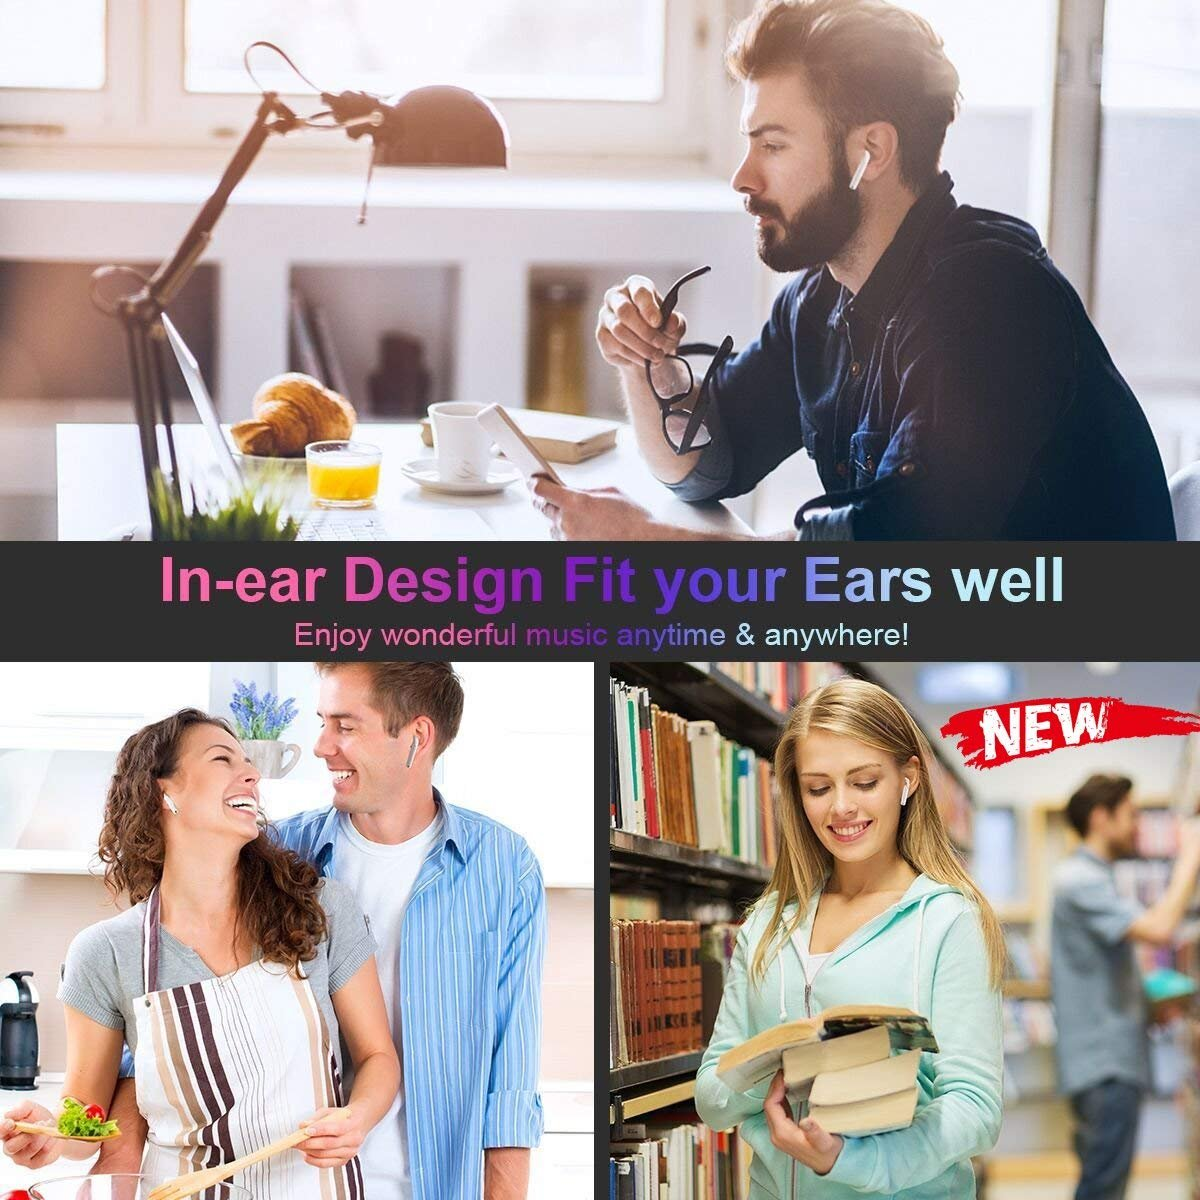 HD Bluetooth Headset - Wireless Headphones Women's Wireless Headphones Men - Sports in-Ear Headphones Wireless Headphones Stereo Headphones Sports Headphones with Microphone Mini in-Ear Headphones by jieanruituo (Image #5)